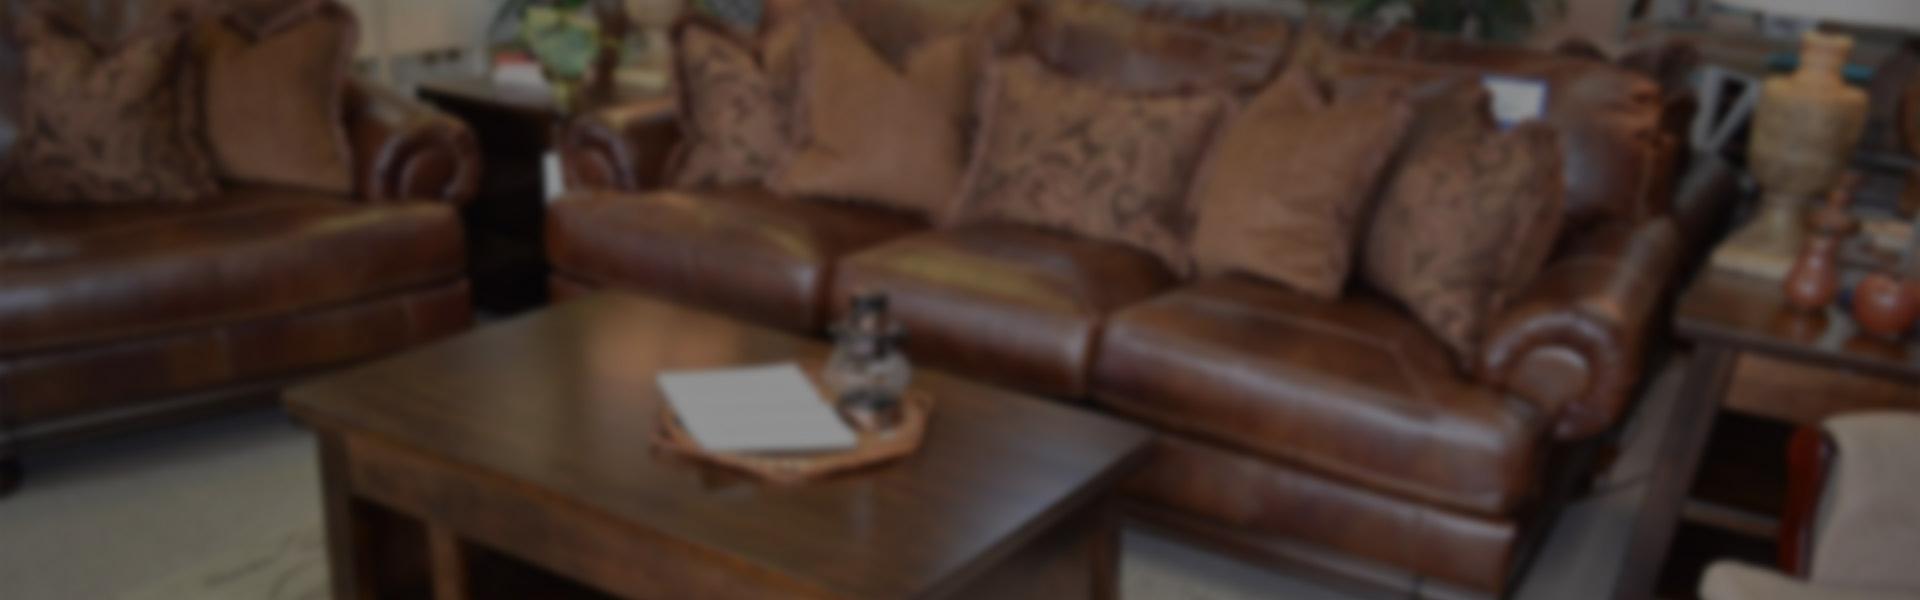 Furniture And Mattress Store In Valdosta, GA | Home Décor